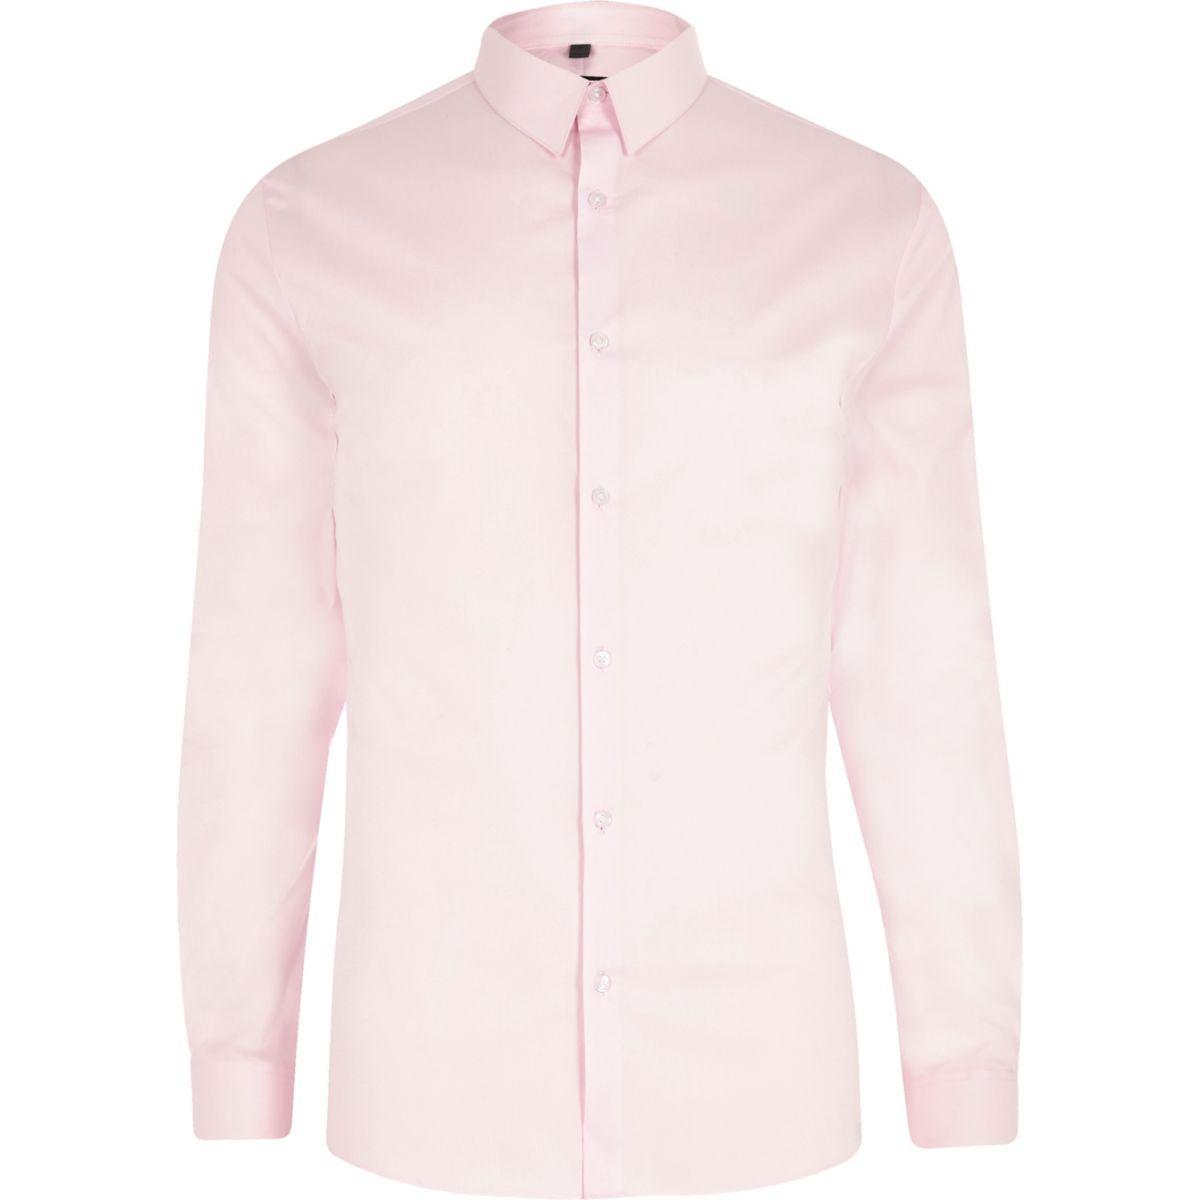 Pink poplin long sleeve muscle fit shirt